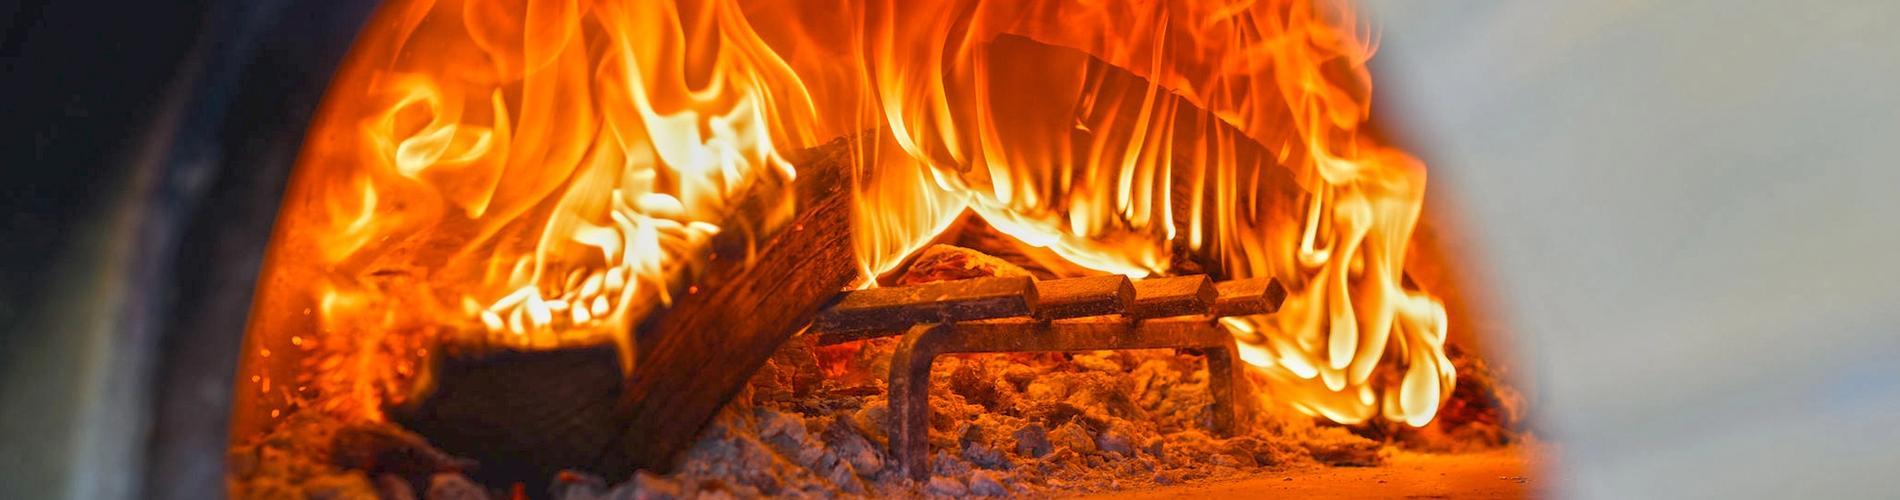 Roaring Fire in the Corvo Bianco Wood Fired Pizza Oven